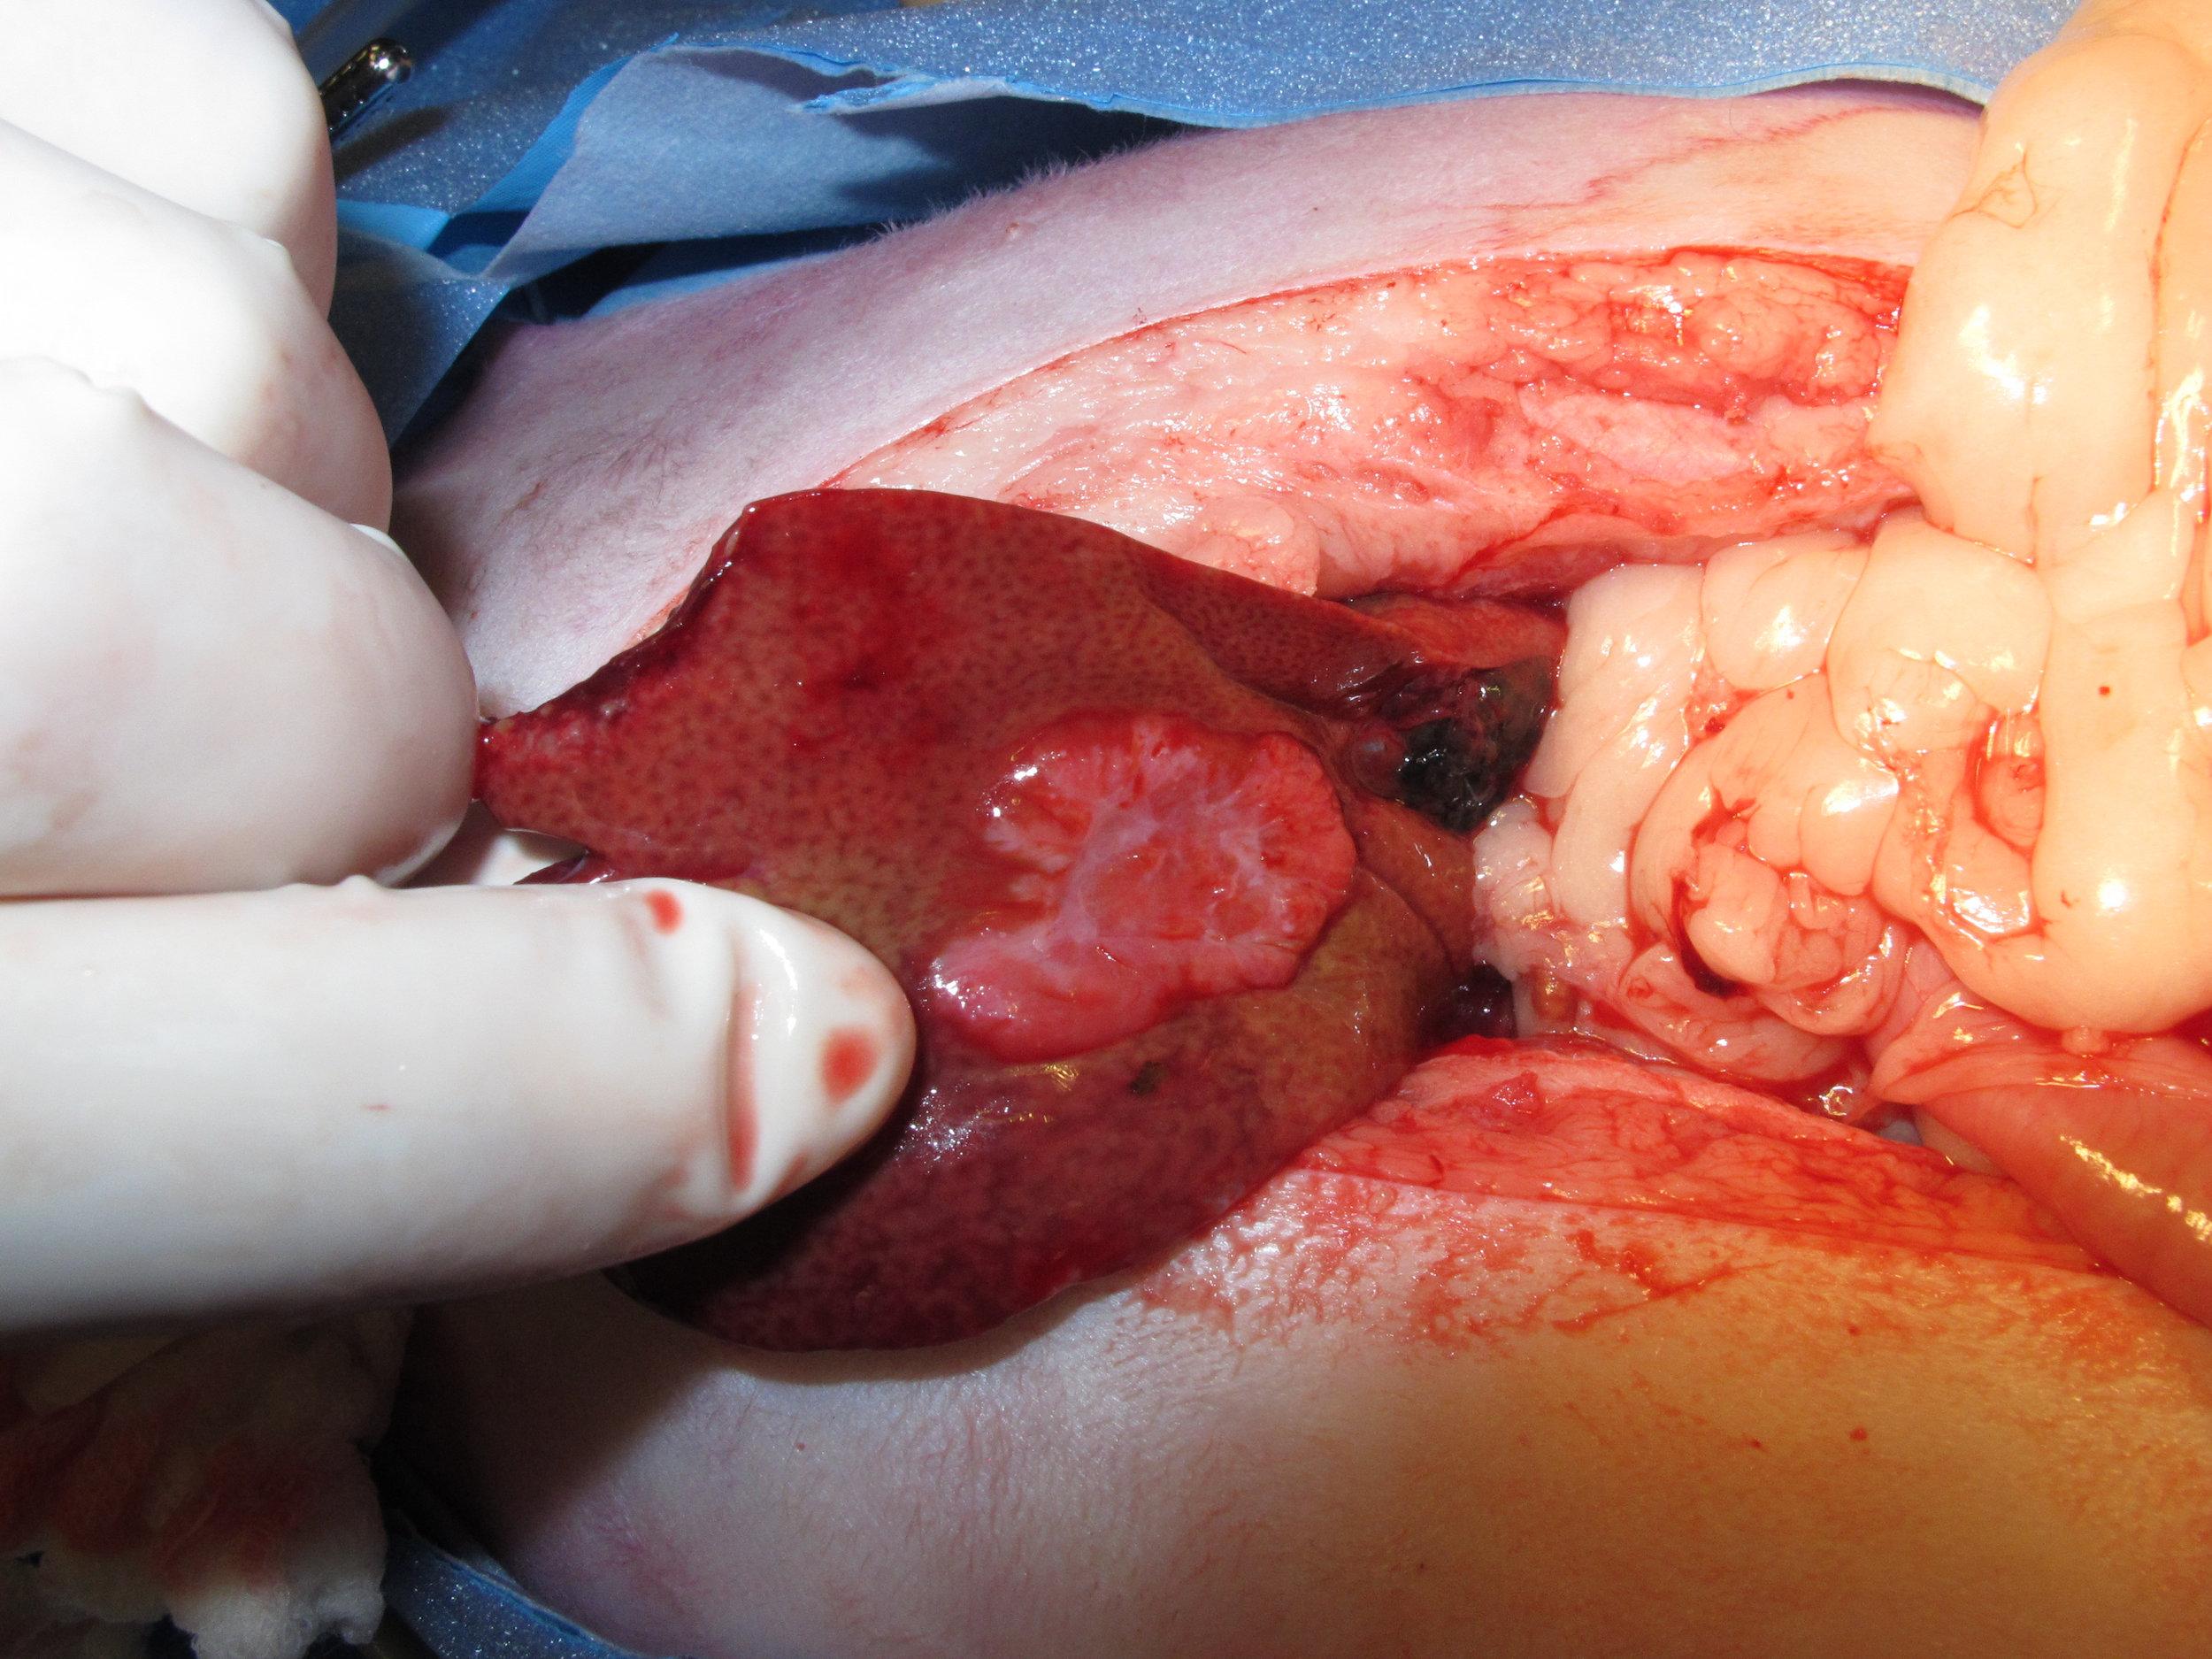 liver biliary cystadenoma 56 cat intraop 077755.jpg